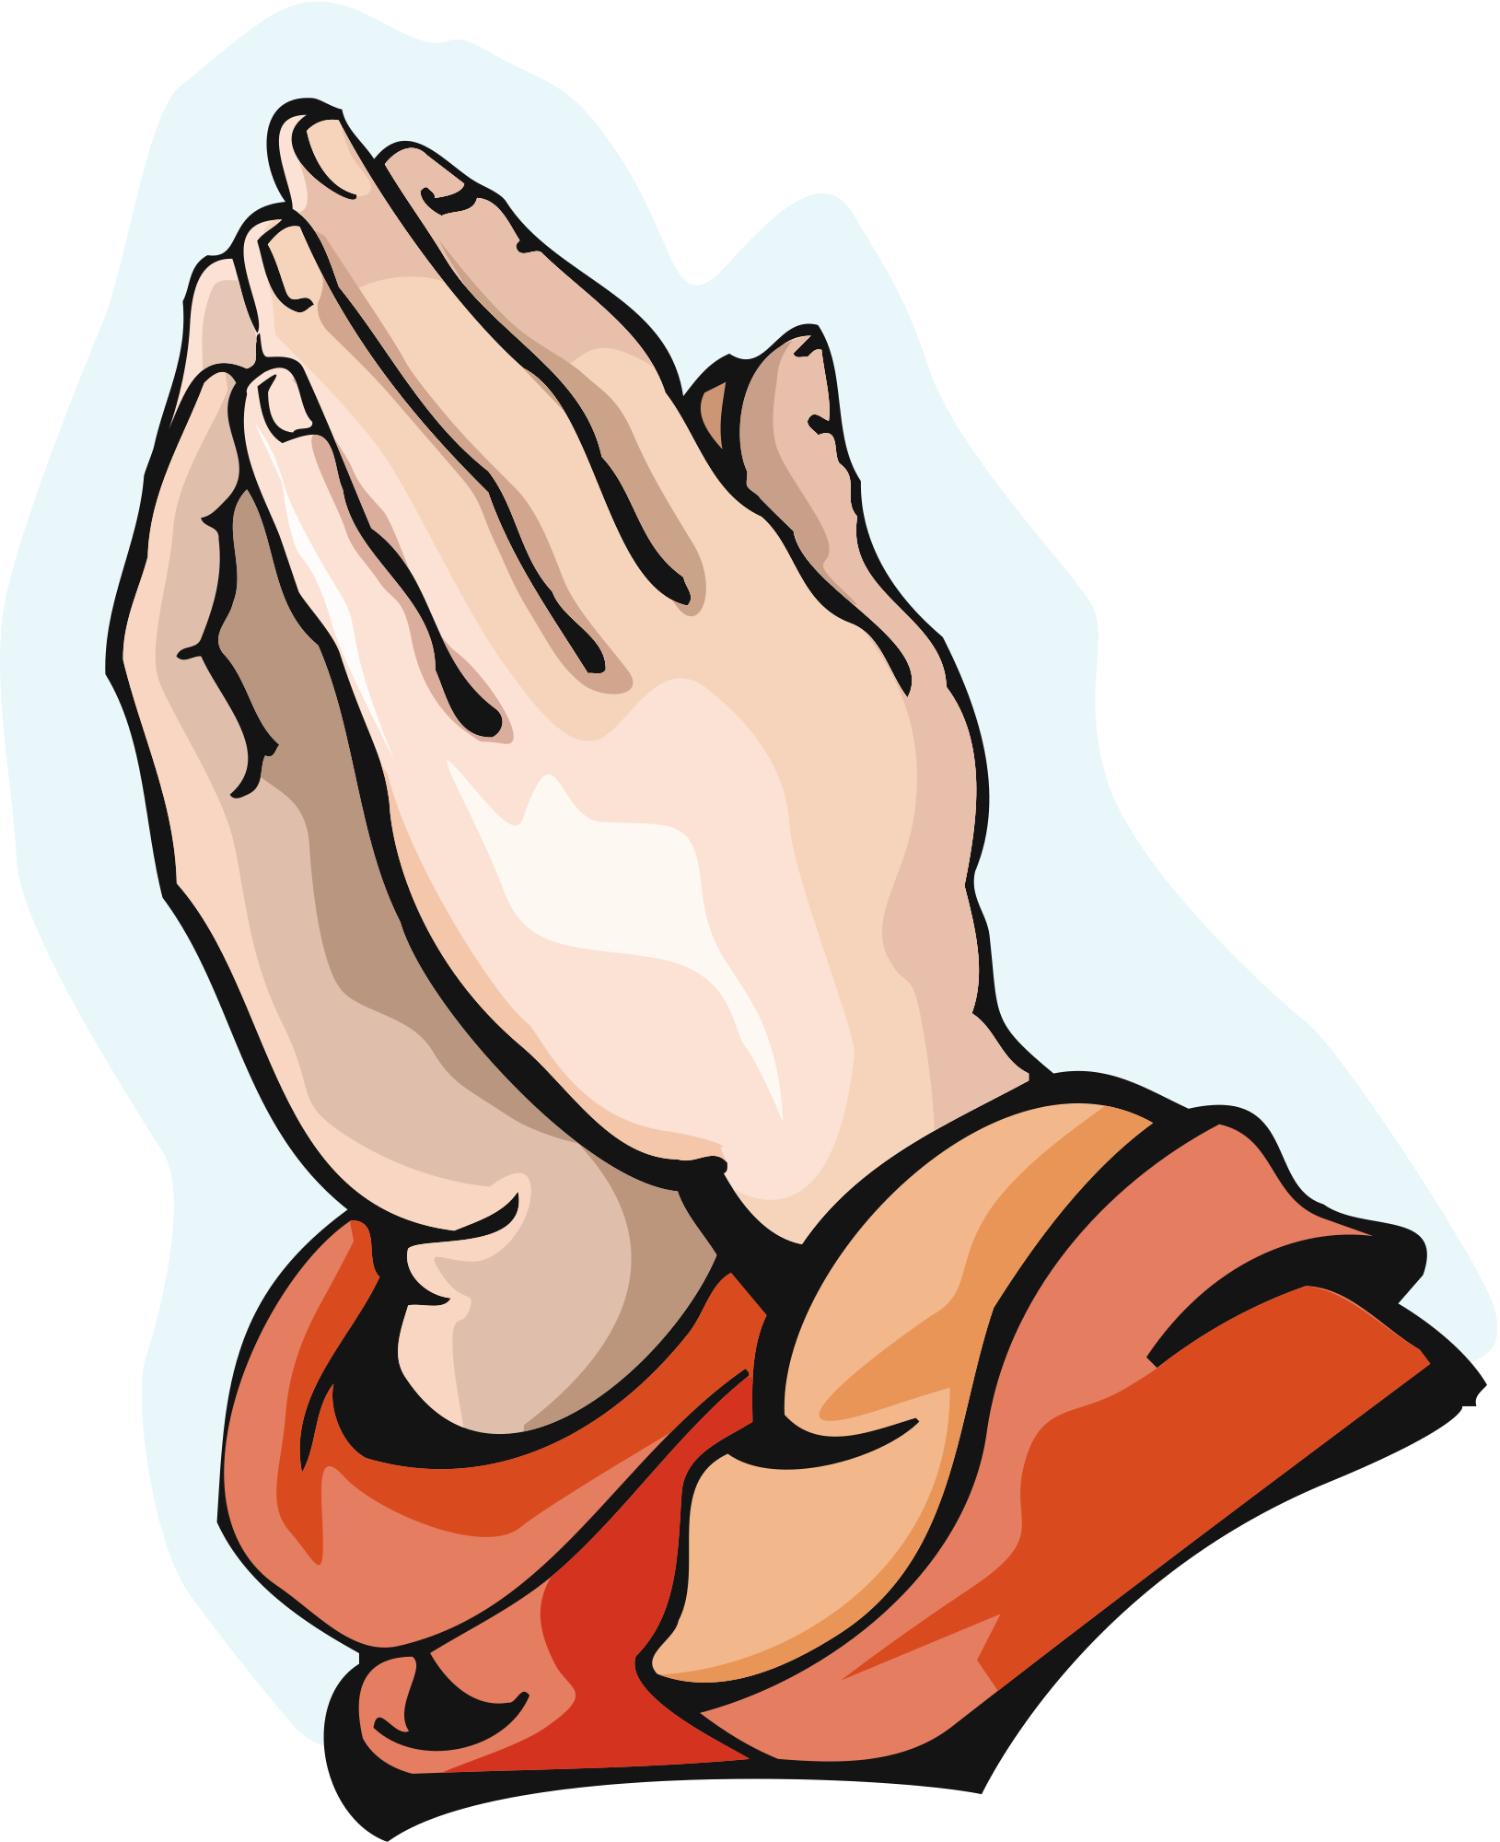 clipart on prayer - photo #40